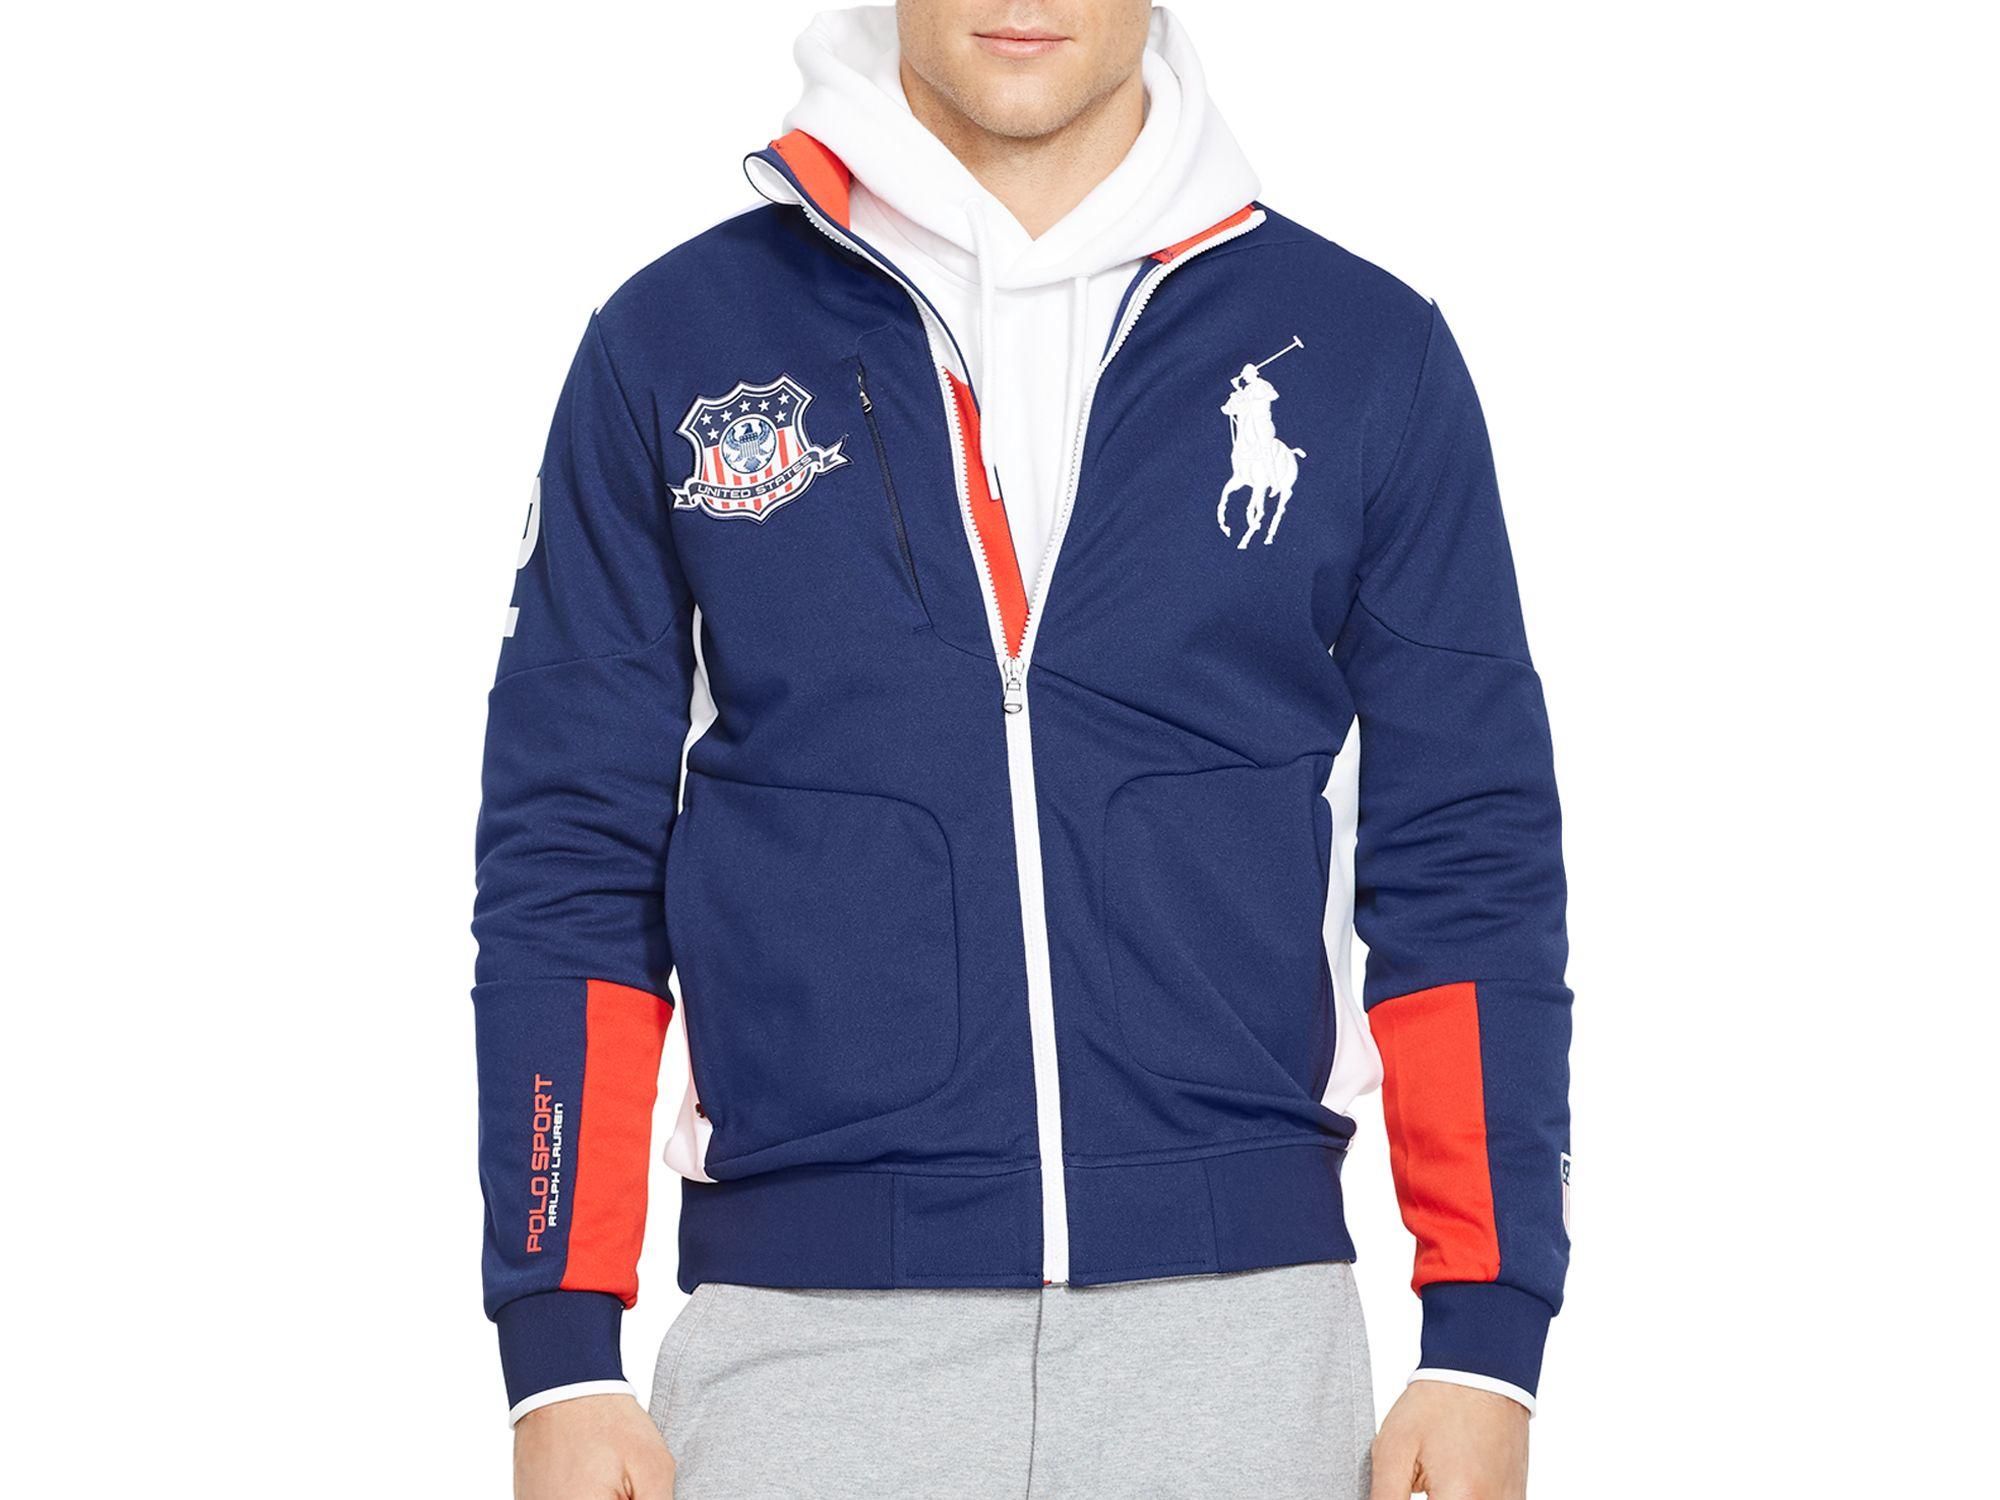 ralph lauren polo sport usa full zip track jacket in blue for men. Black Bedroom Furniture Sets. Home Design Ideas